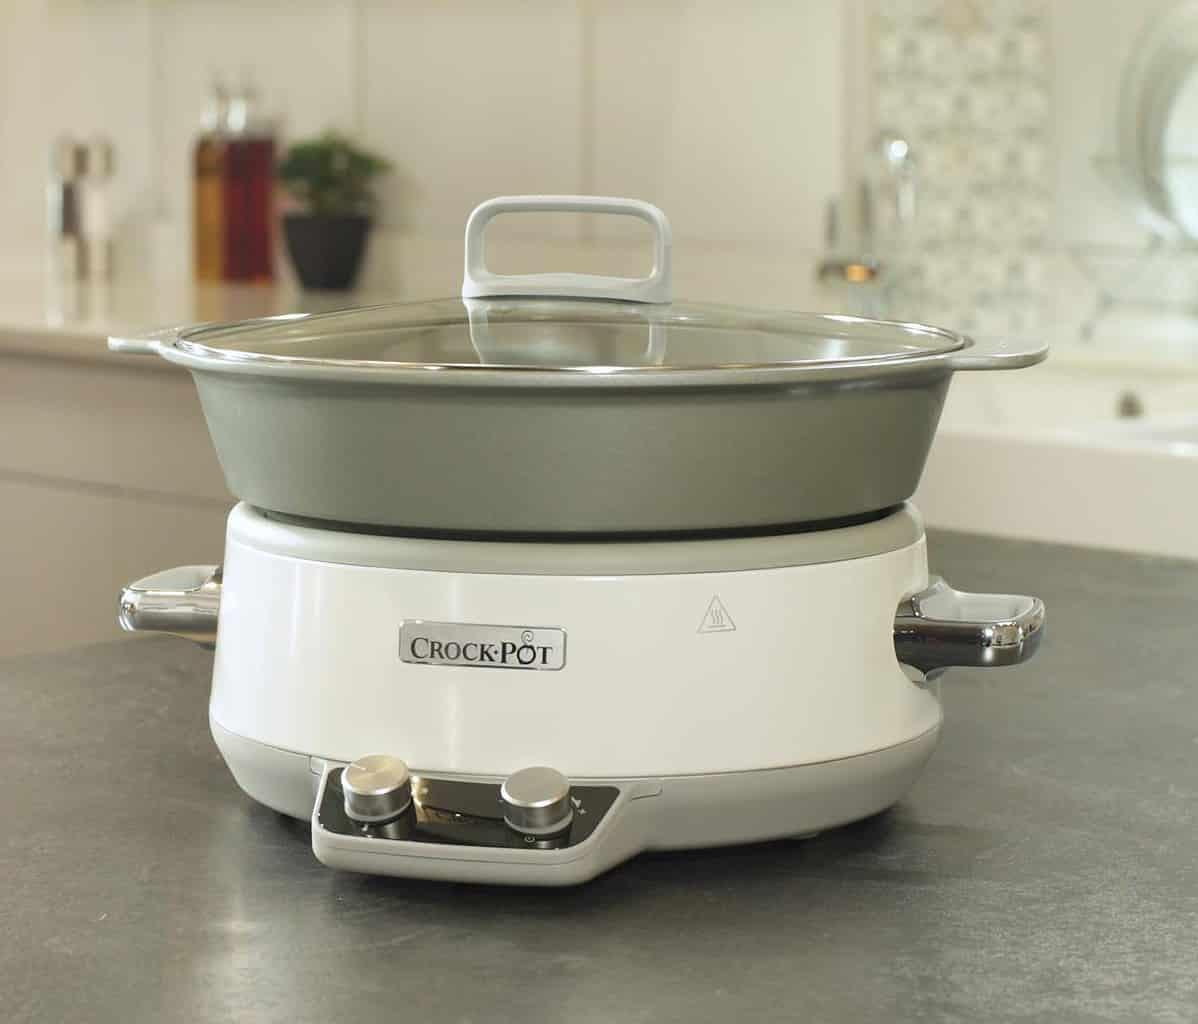 Crock-Pot Duraceramic CSC027X - Olla de cocción lenta digital, 6 L, color blanco